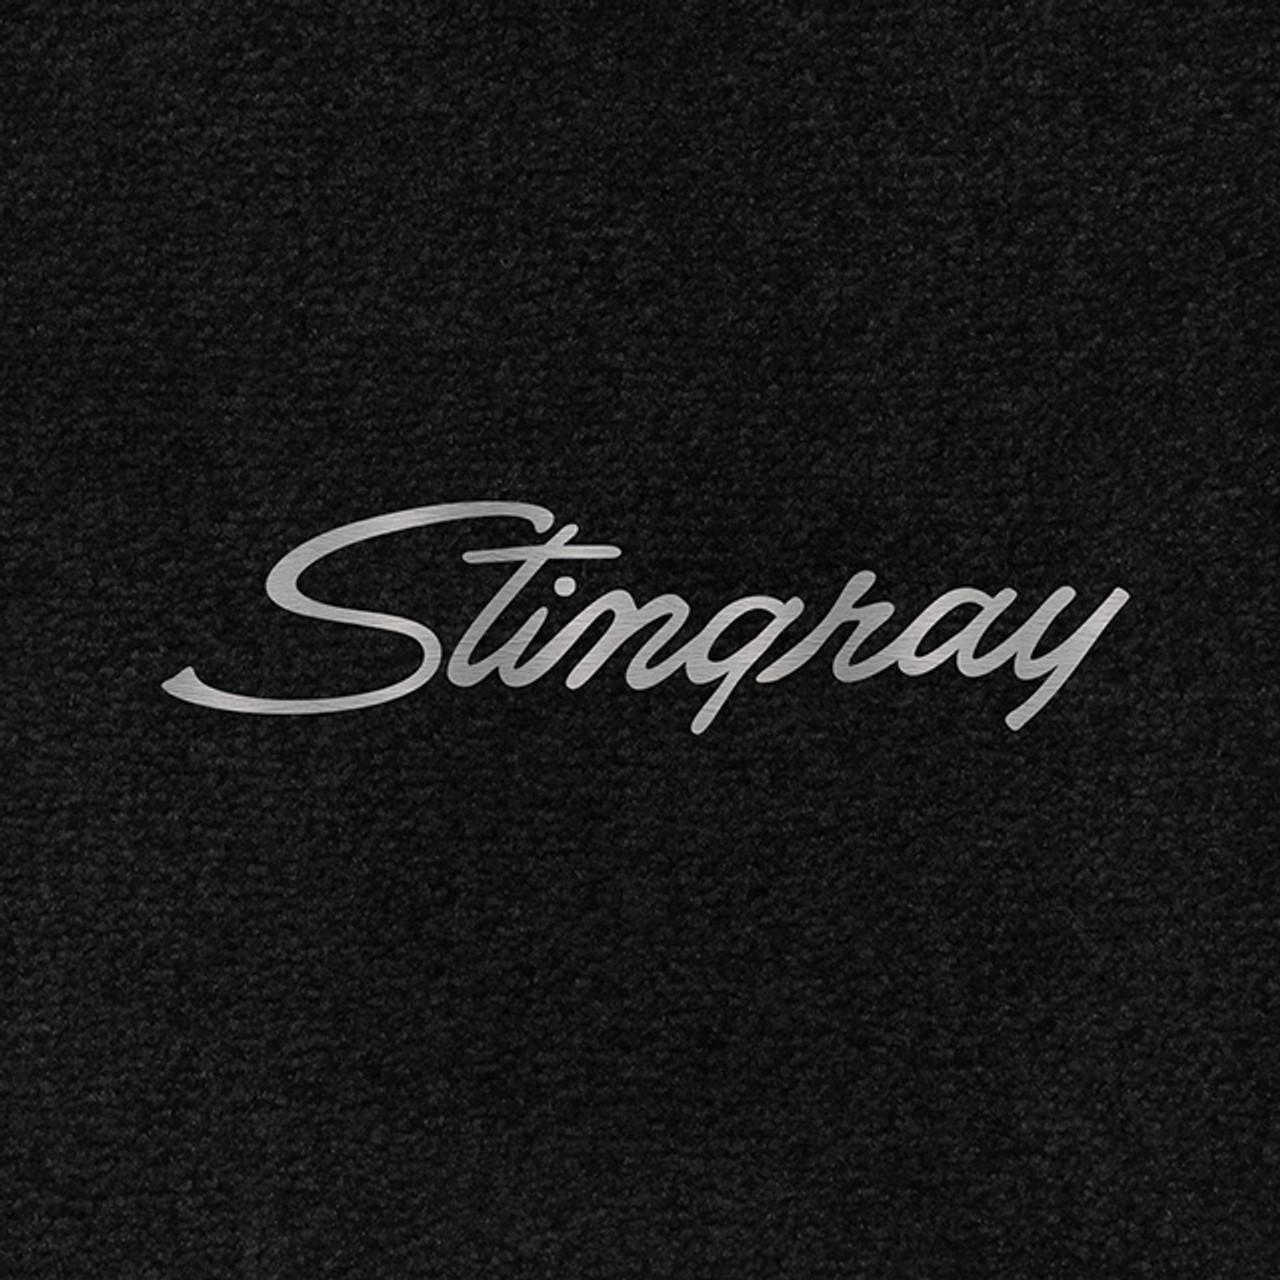 1969-1976 Stingray Script